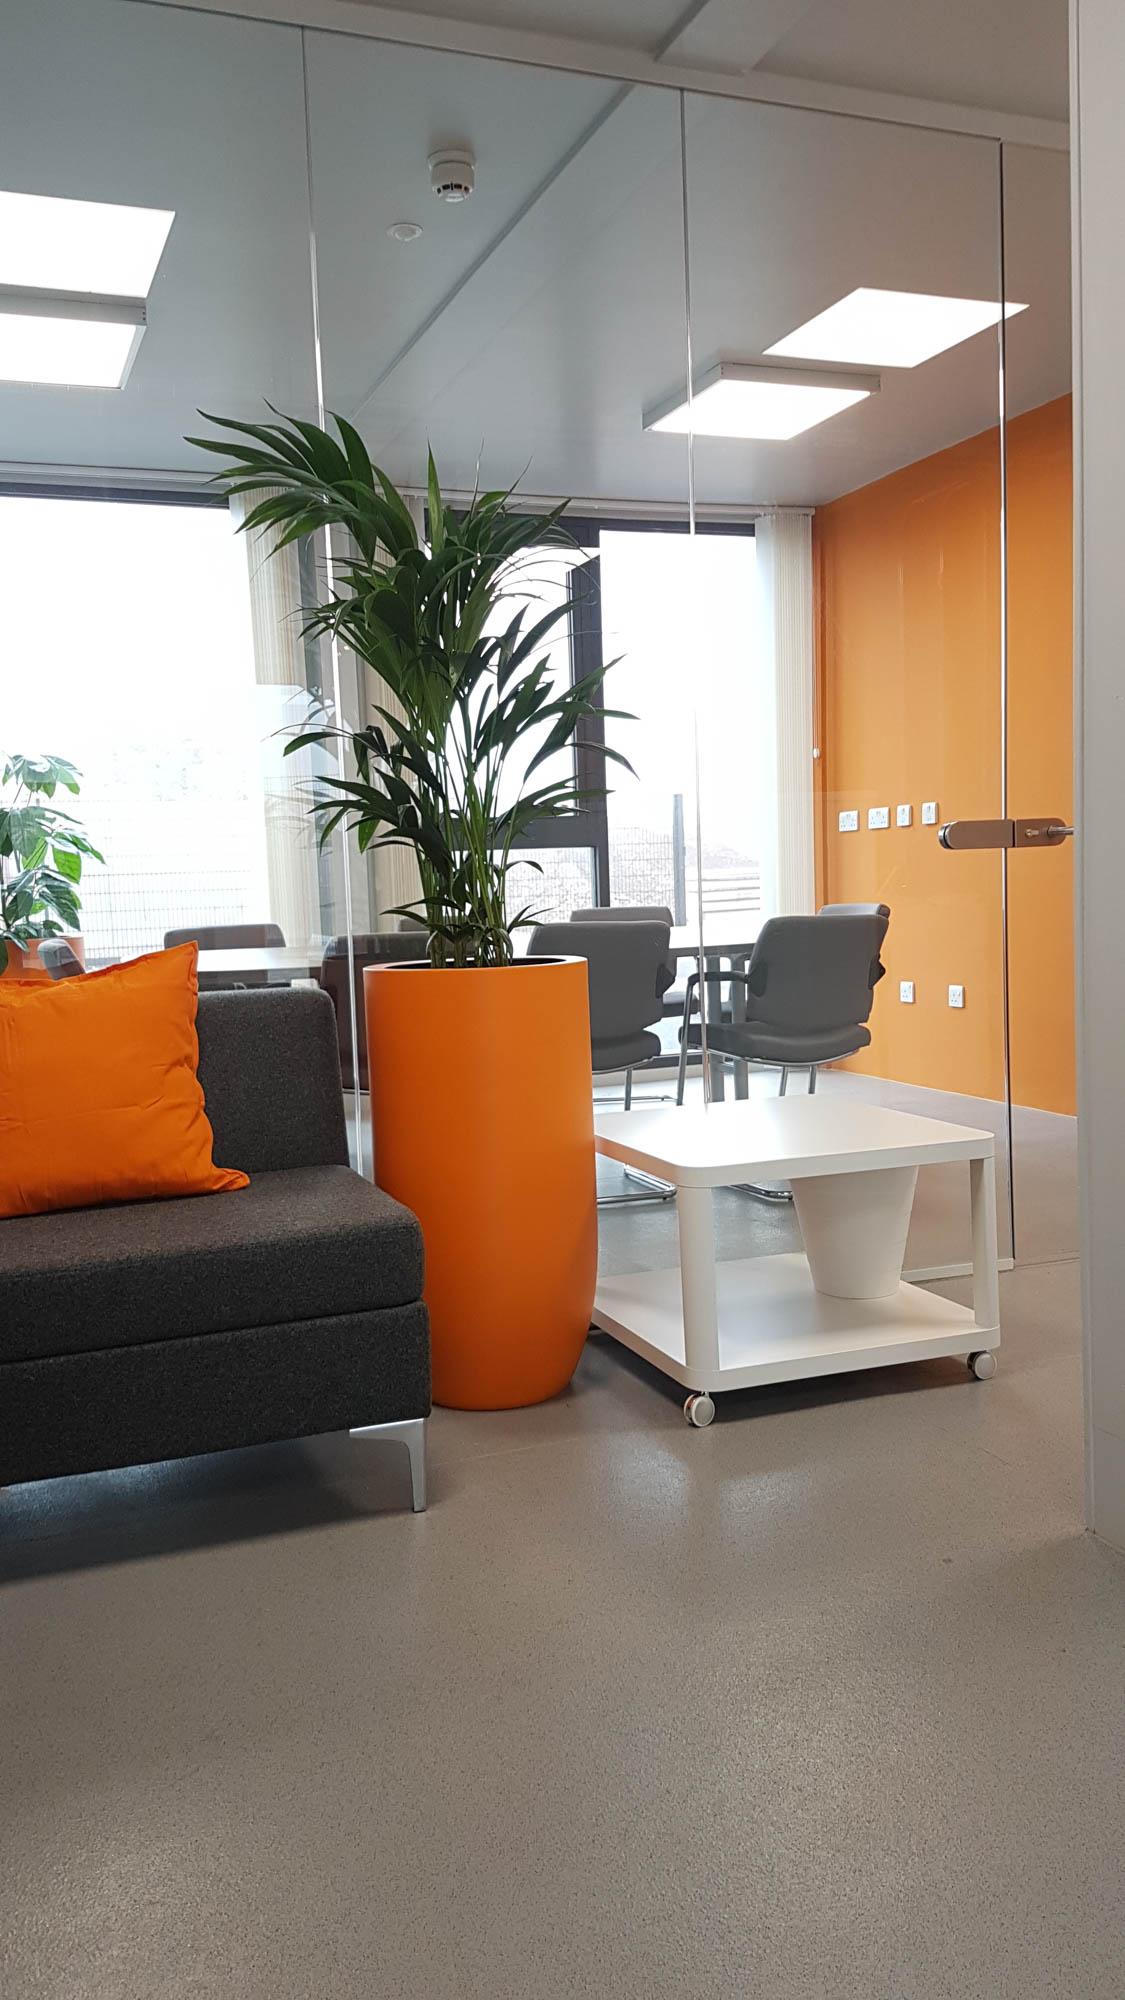 bristol-and-avon-interior-plants-planters-custom-bespoke-branded-construction-plantcare-image-6